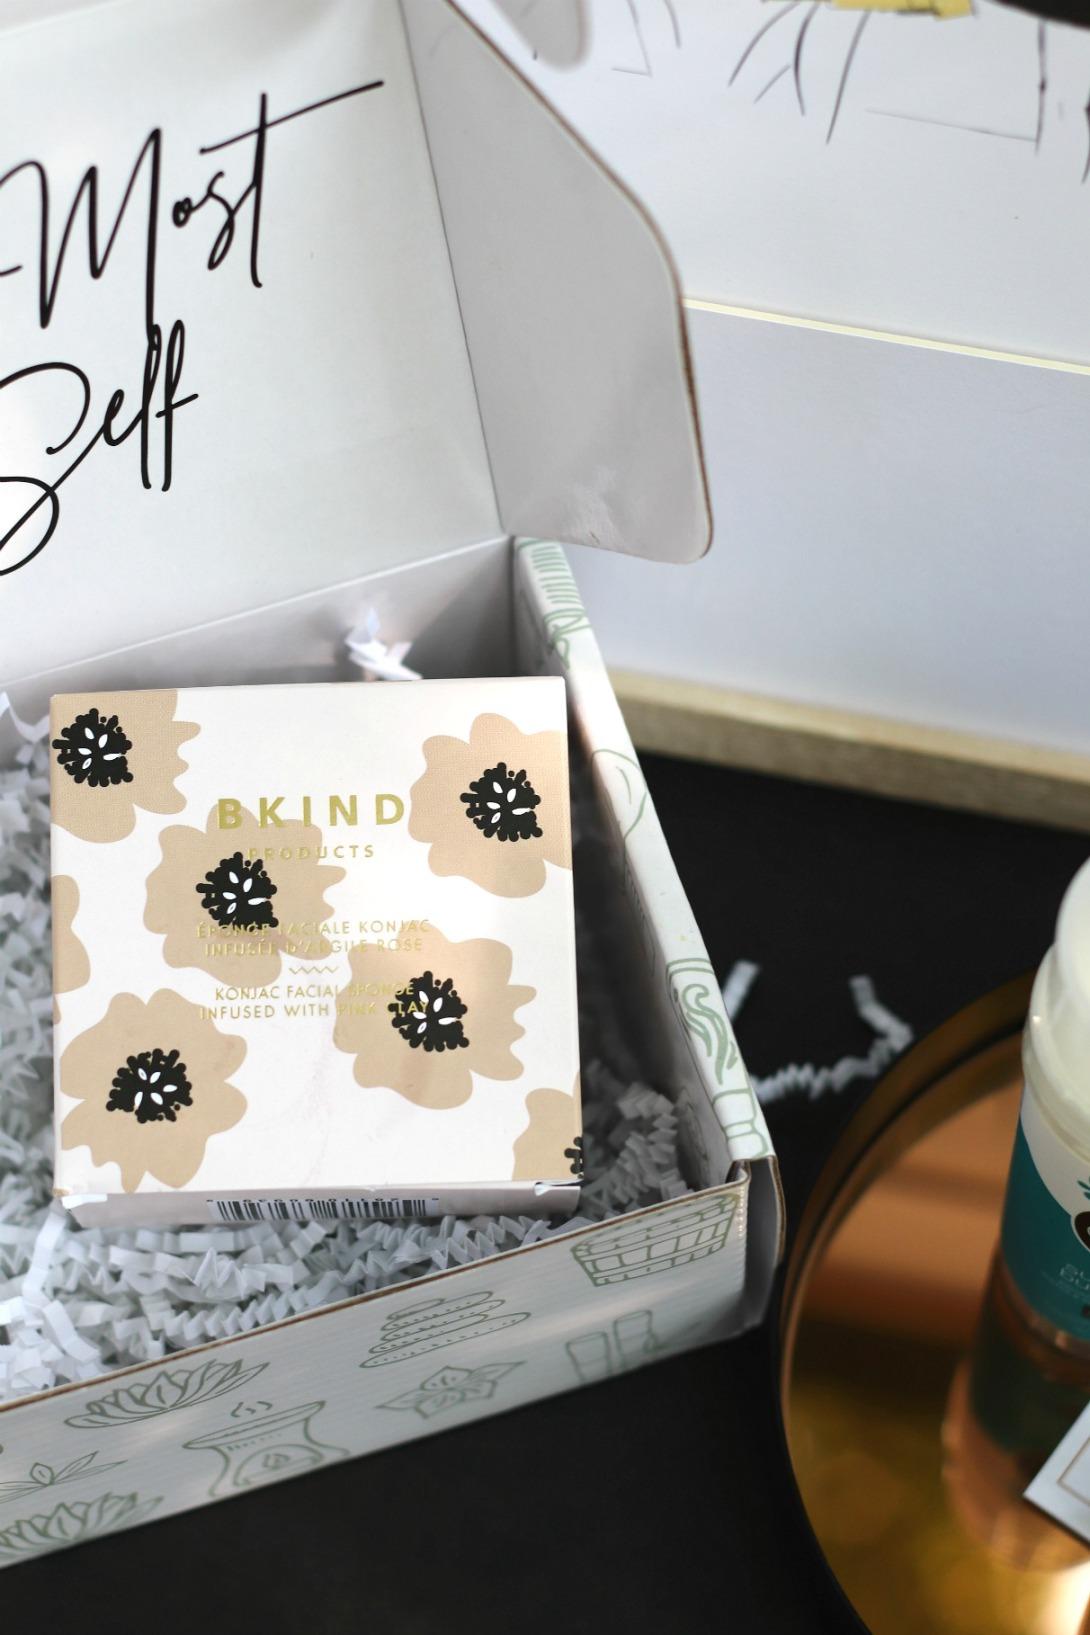 Love Aiki BKIND Konjac Facial Sponge in box